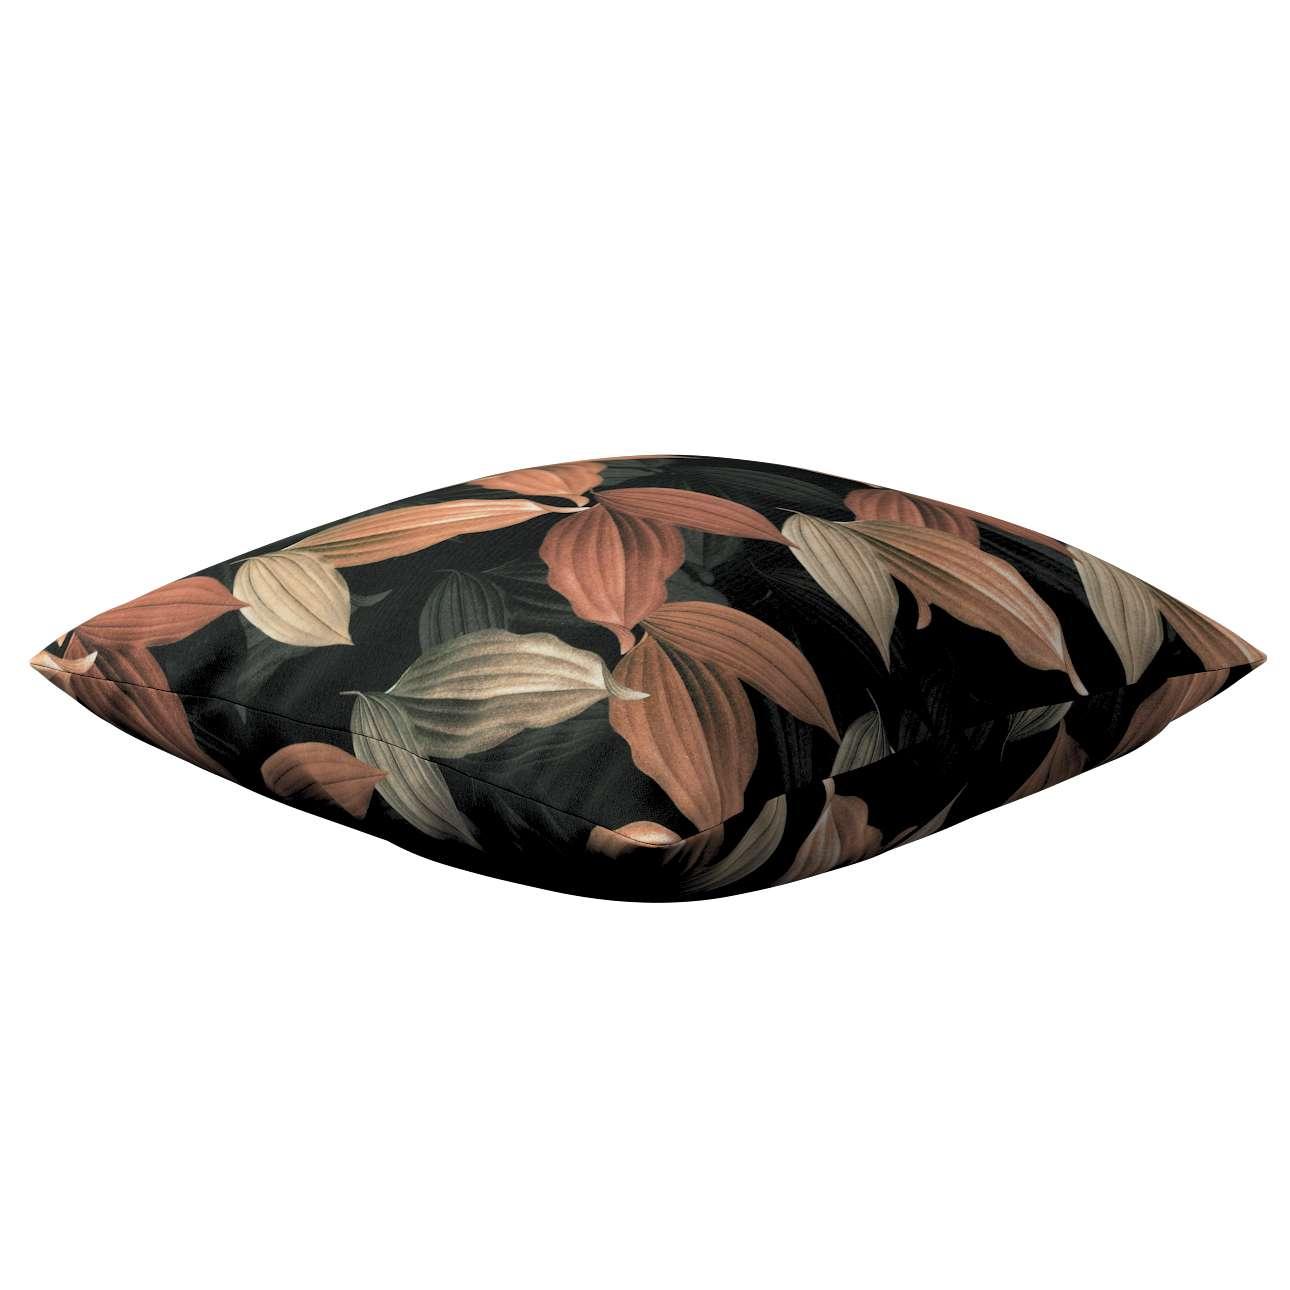 Kinga - potah na polštář jednoduchý v kolekci Abigail, látka: 143-21